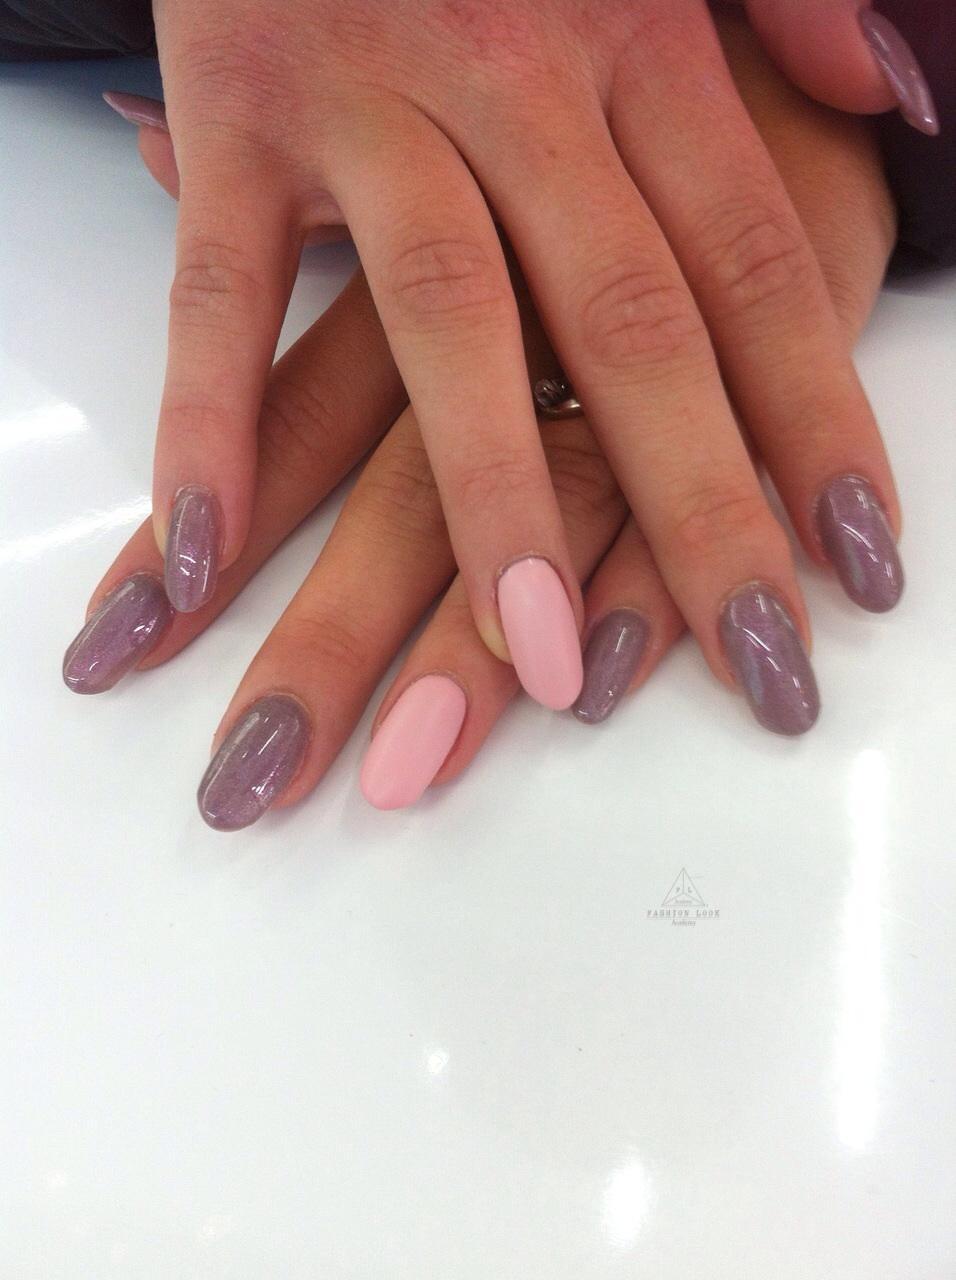 Unghie a mandorla: qualche consiglio per una ottima manicure!